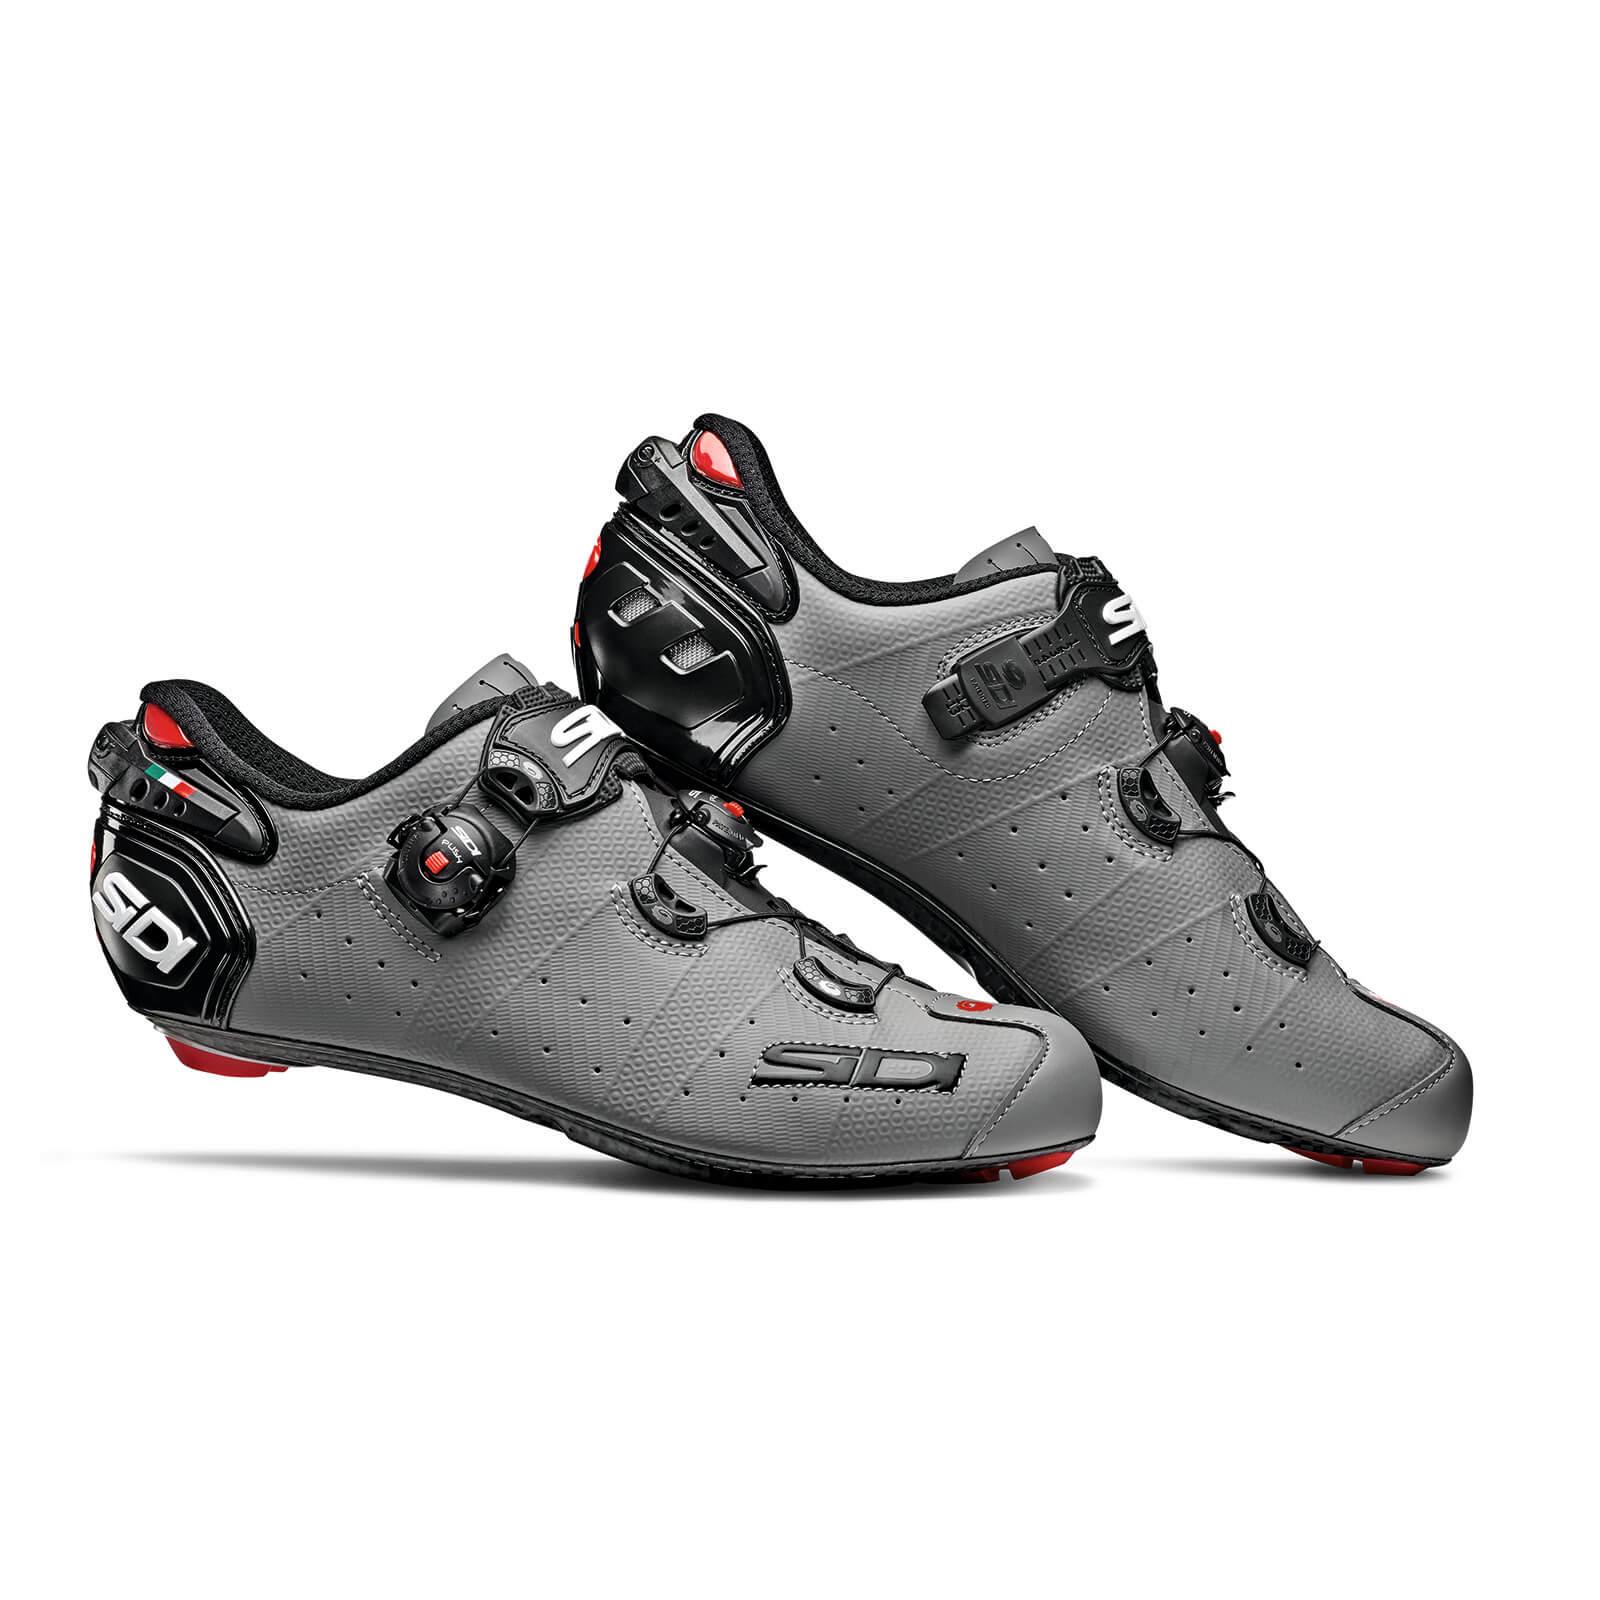 3ca227f0e Sidi Wire 2 Carbon Matt Road Shoes - Matt Grey Black